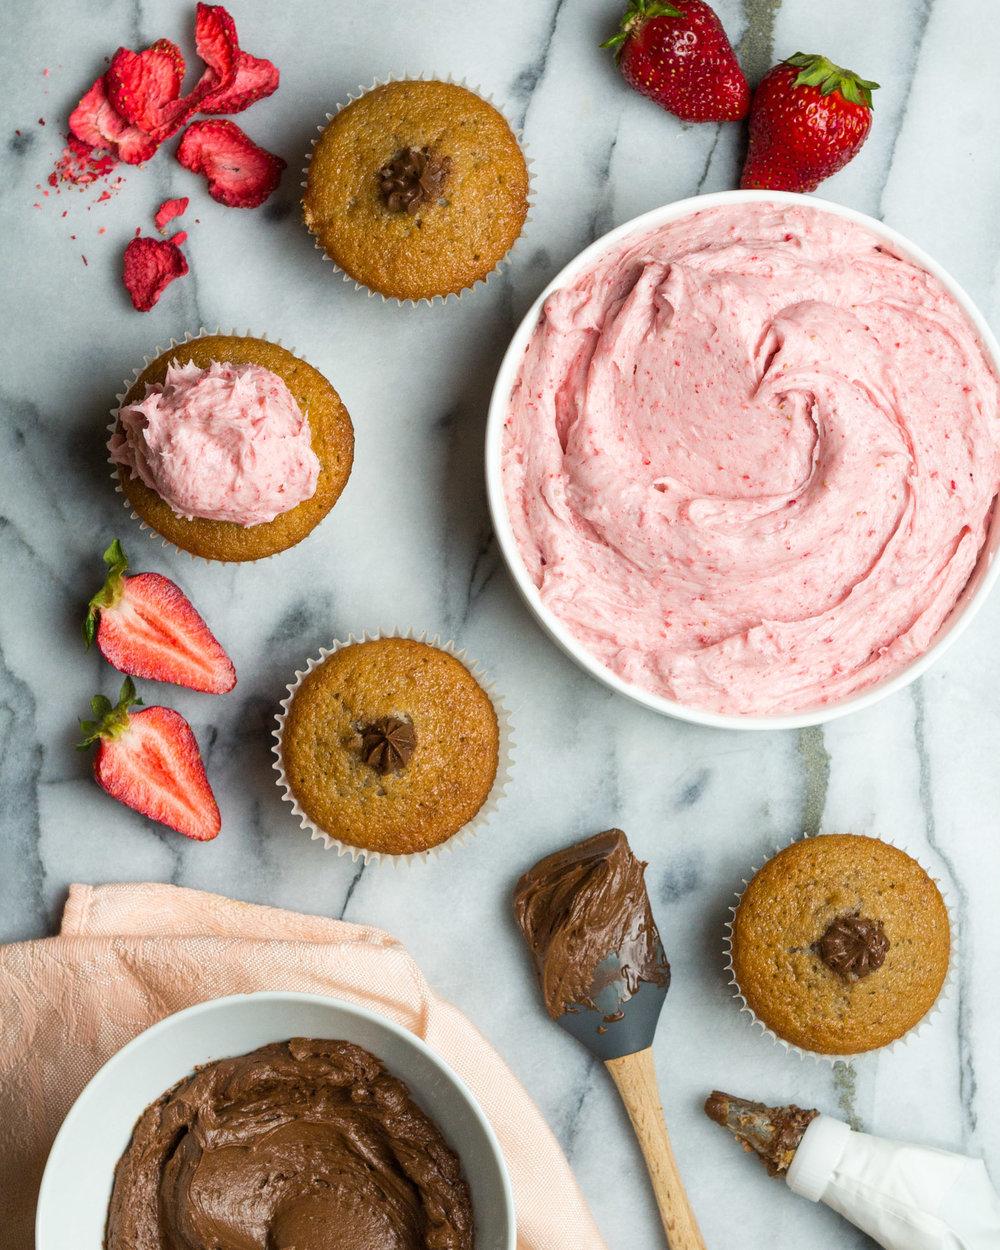 strawberry-cupcakes-5.jpg